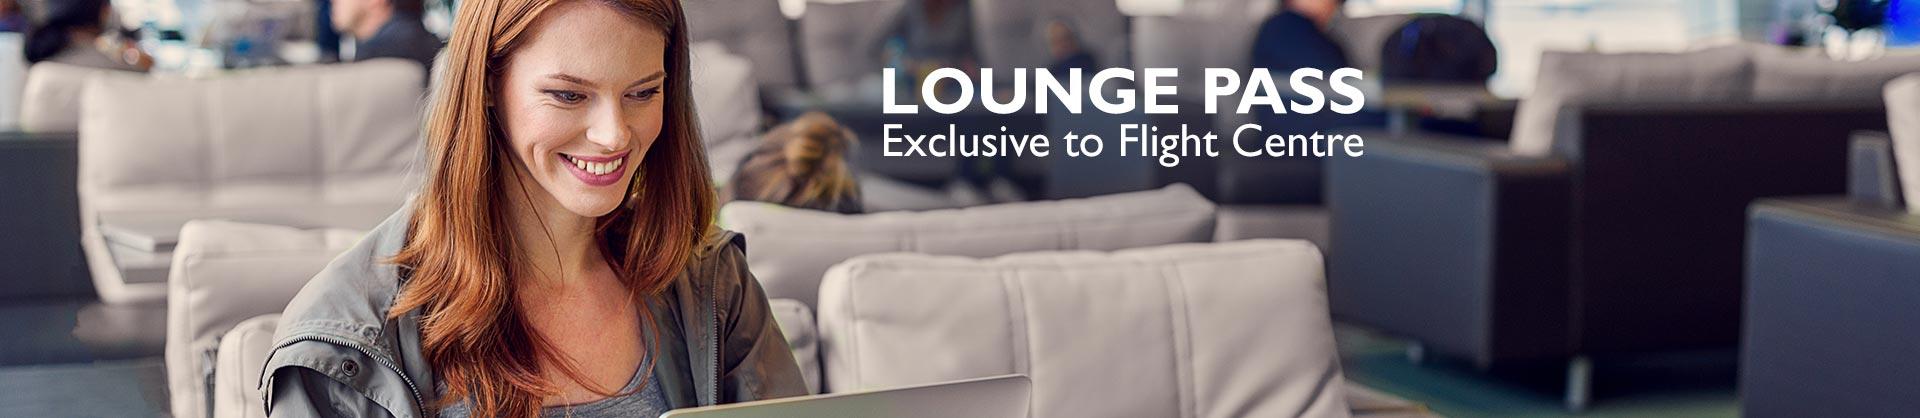 Flight Centre Lounge Pass